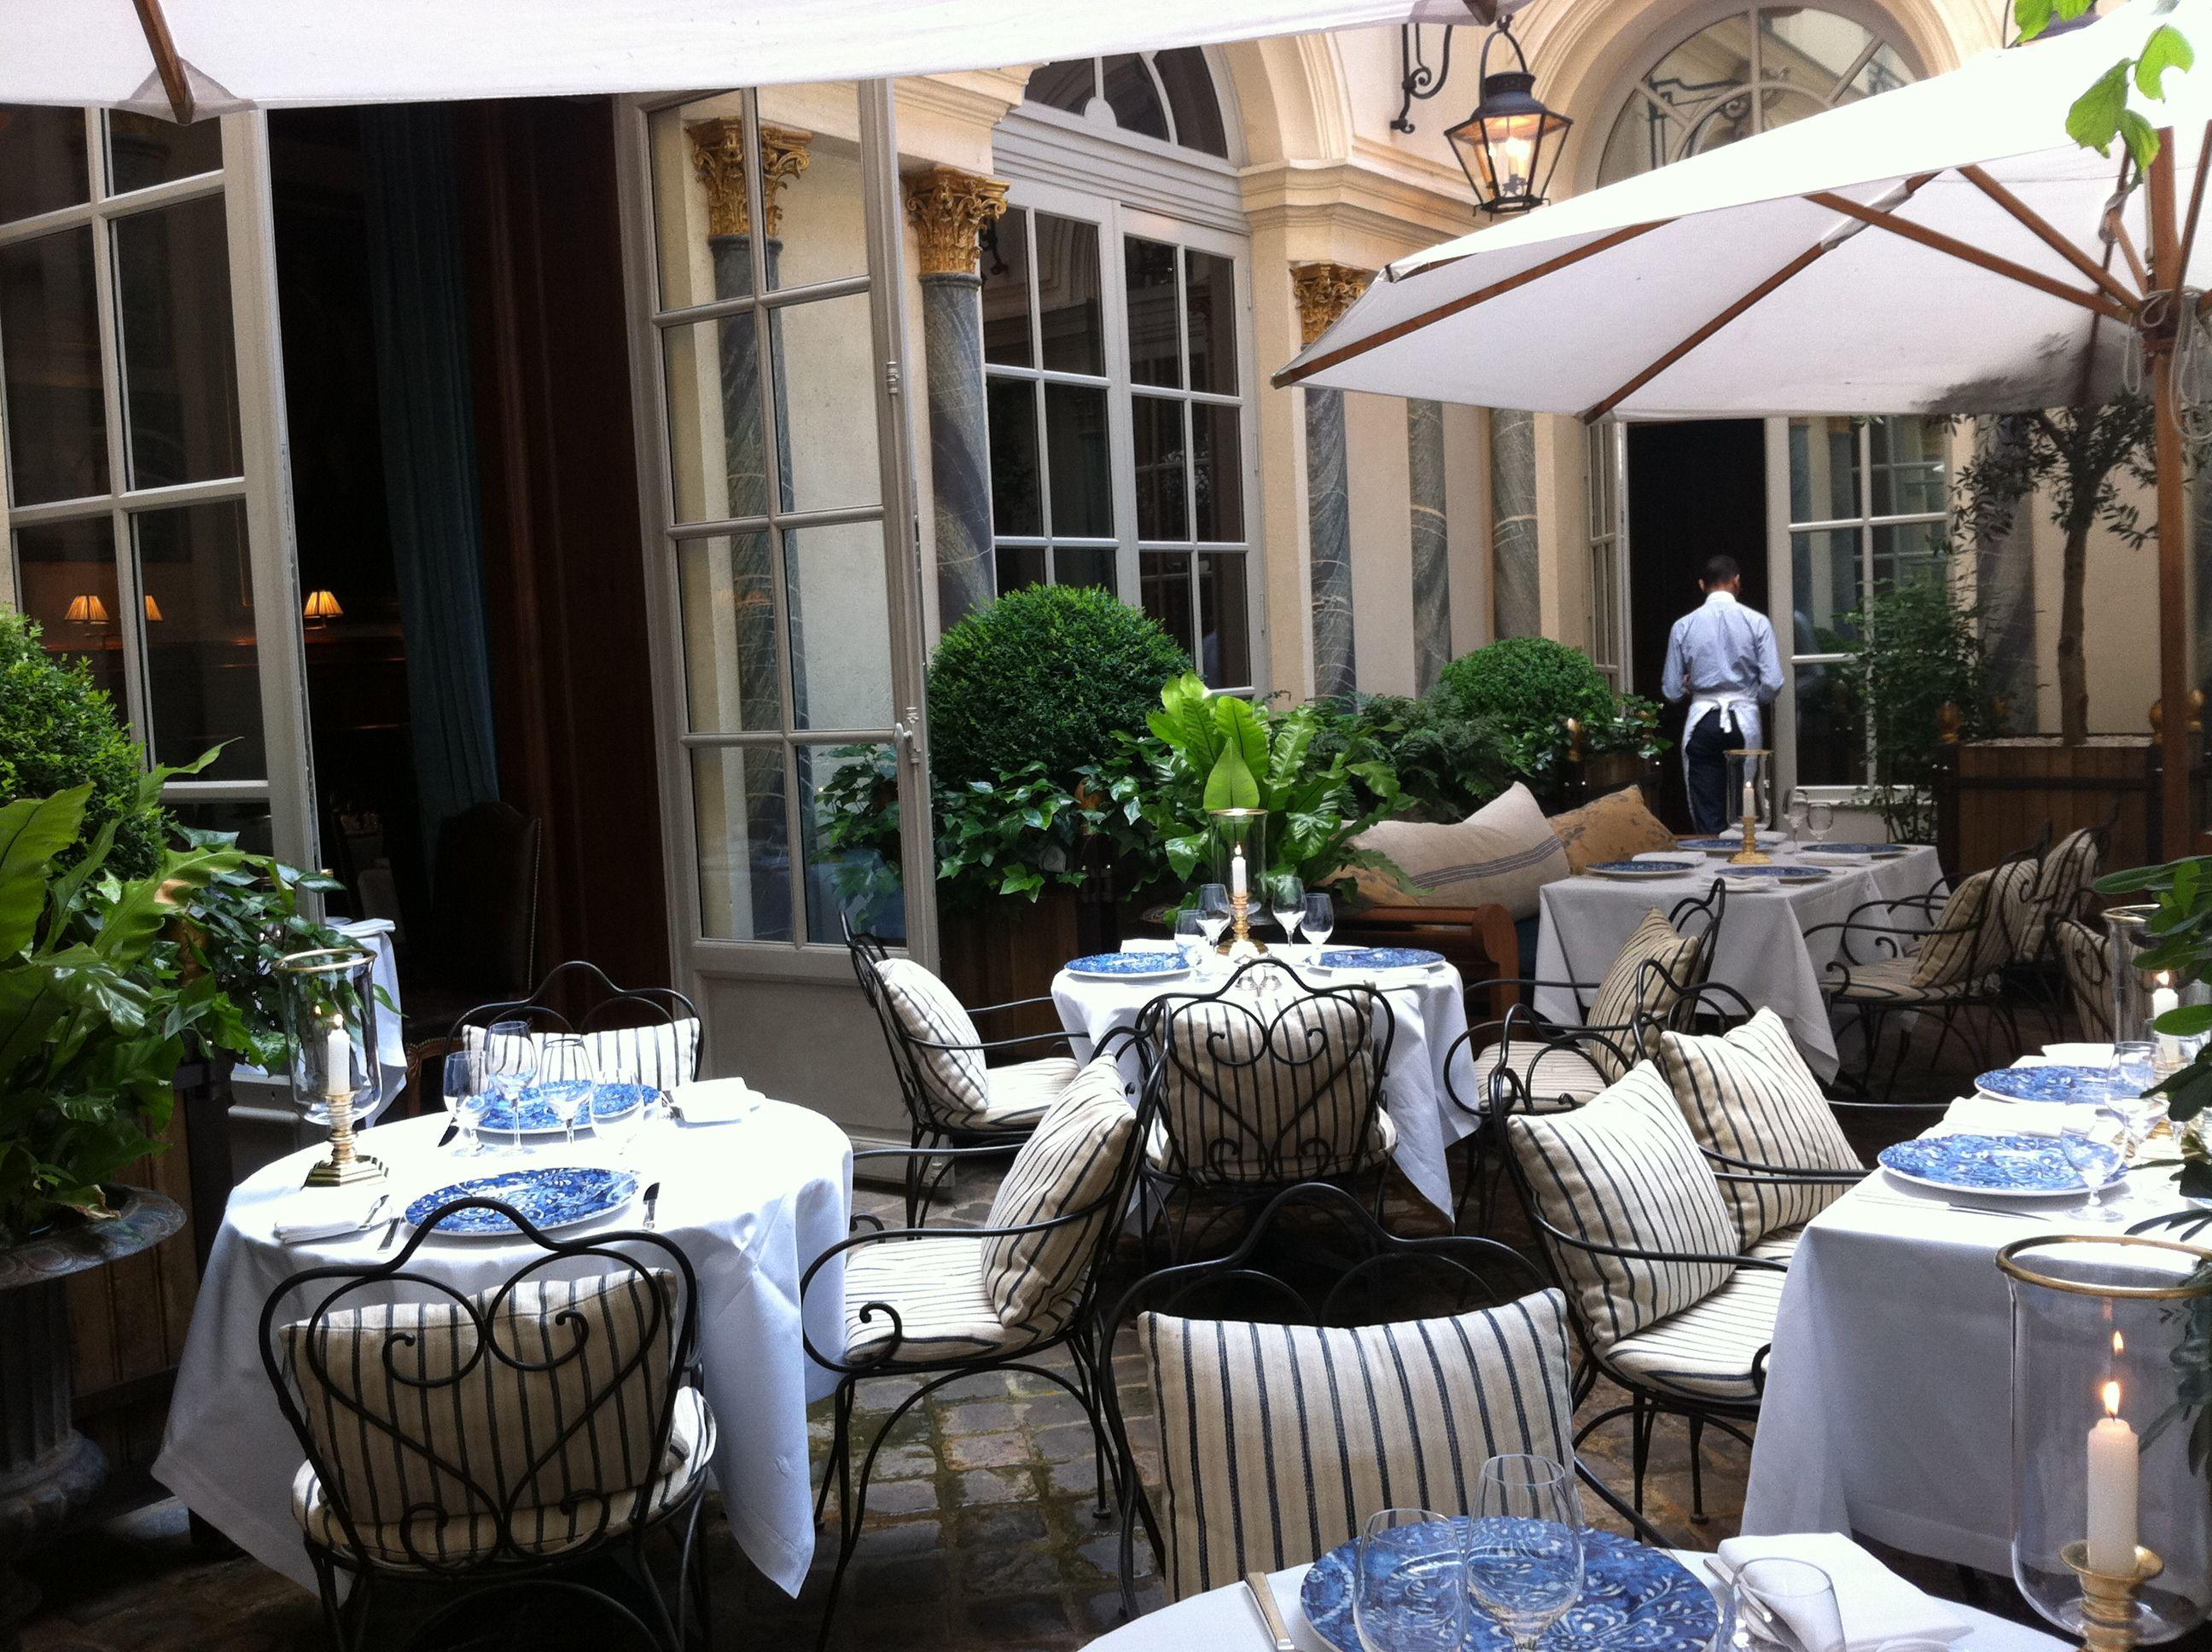 Terraza Restaurant Ralph S In Paris Www Fustaiferro Com Muebles De Forja Decoracion Hosteleria Restaurant Fustaiferro Paris Hage Terrasse Terrasse Hage